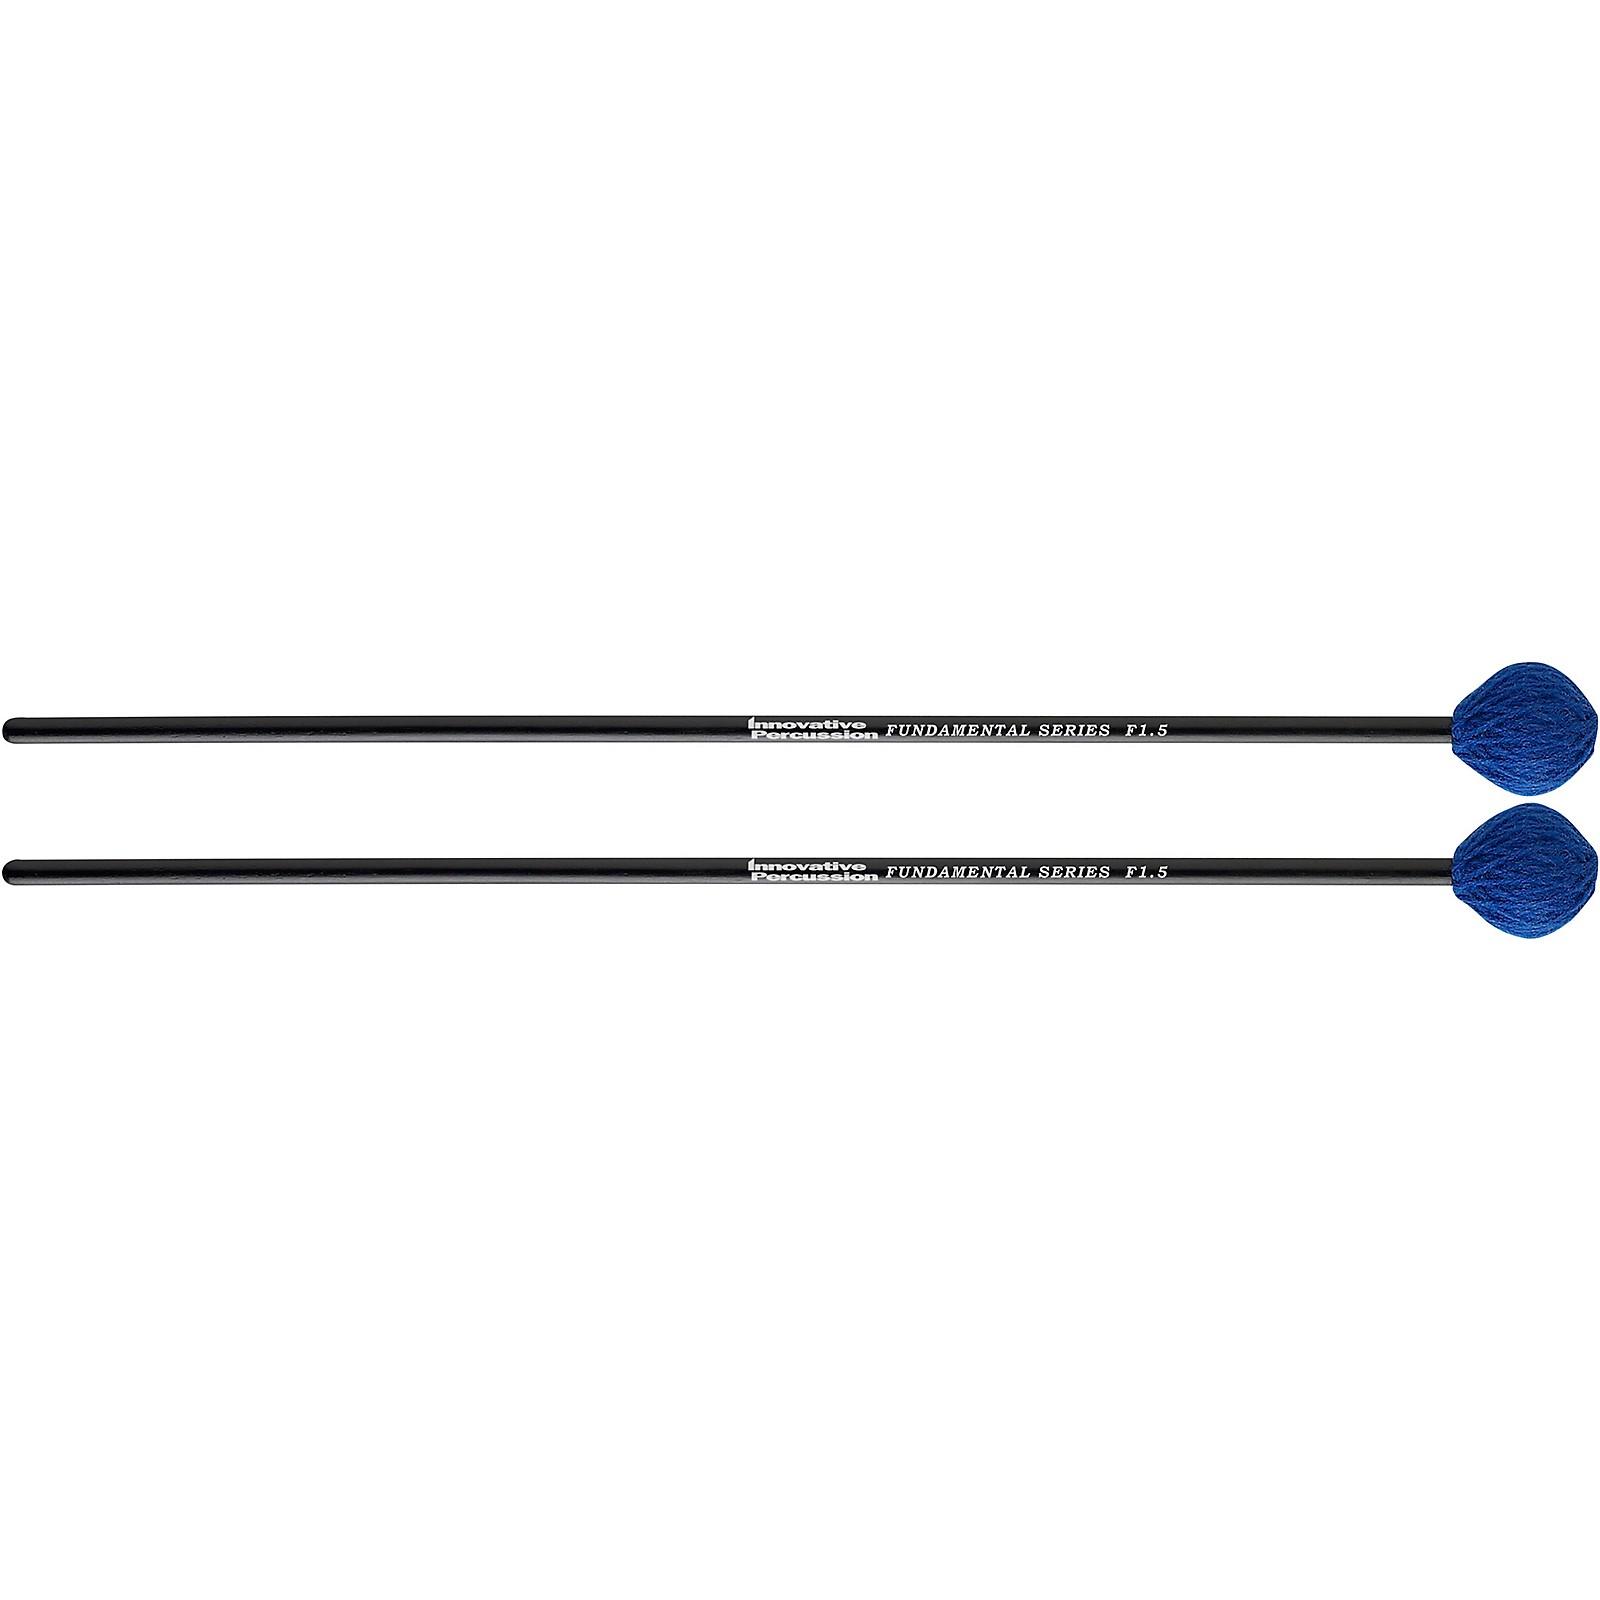 Innovative Percussion Fundamental Series Medium-Soft Marimba Mallet